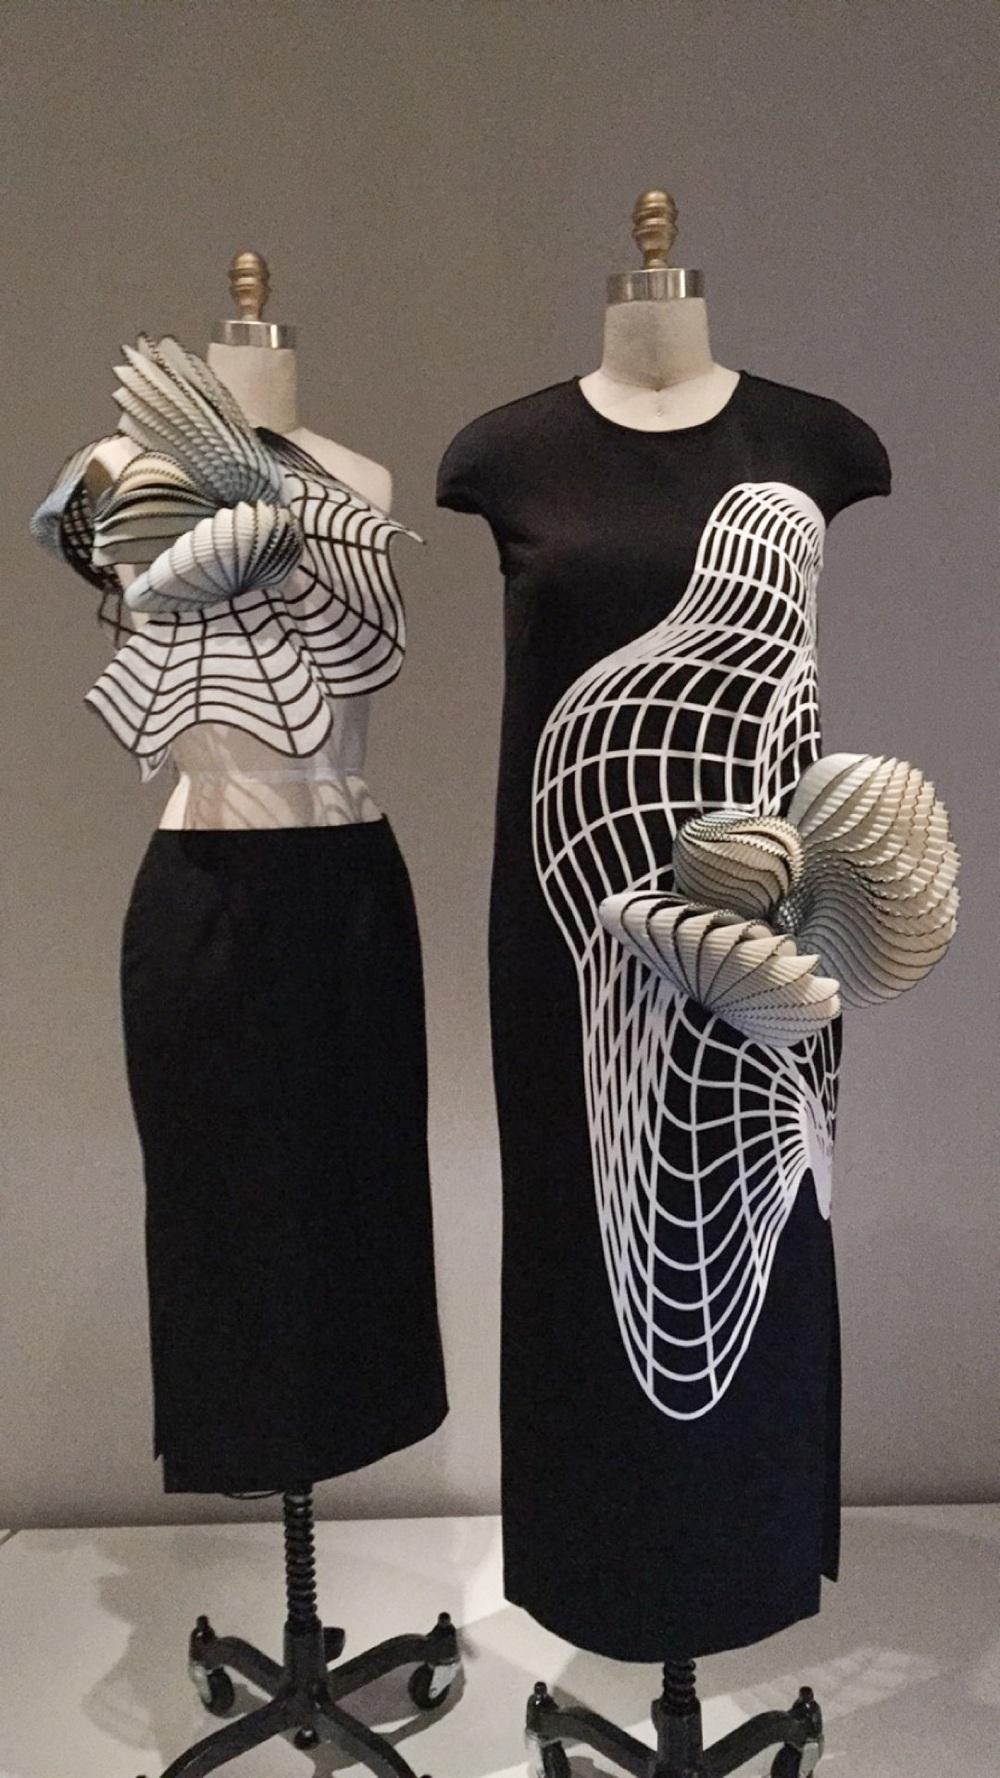 Noa Raviv, 3D Printed Designs